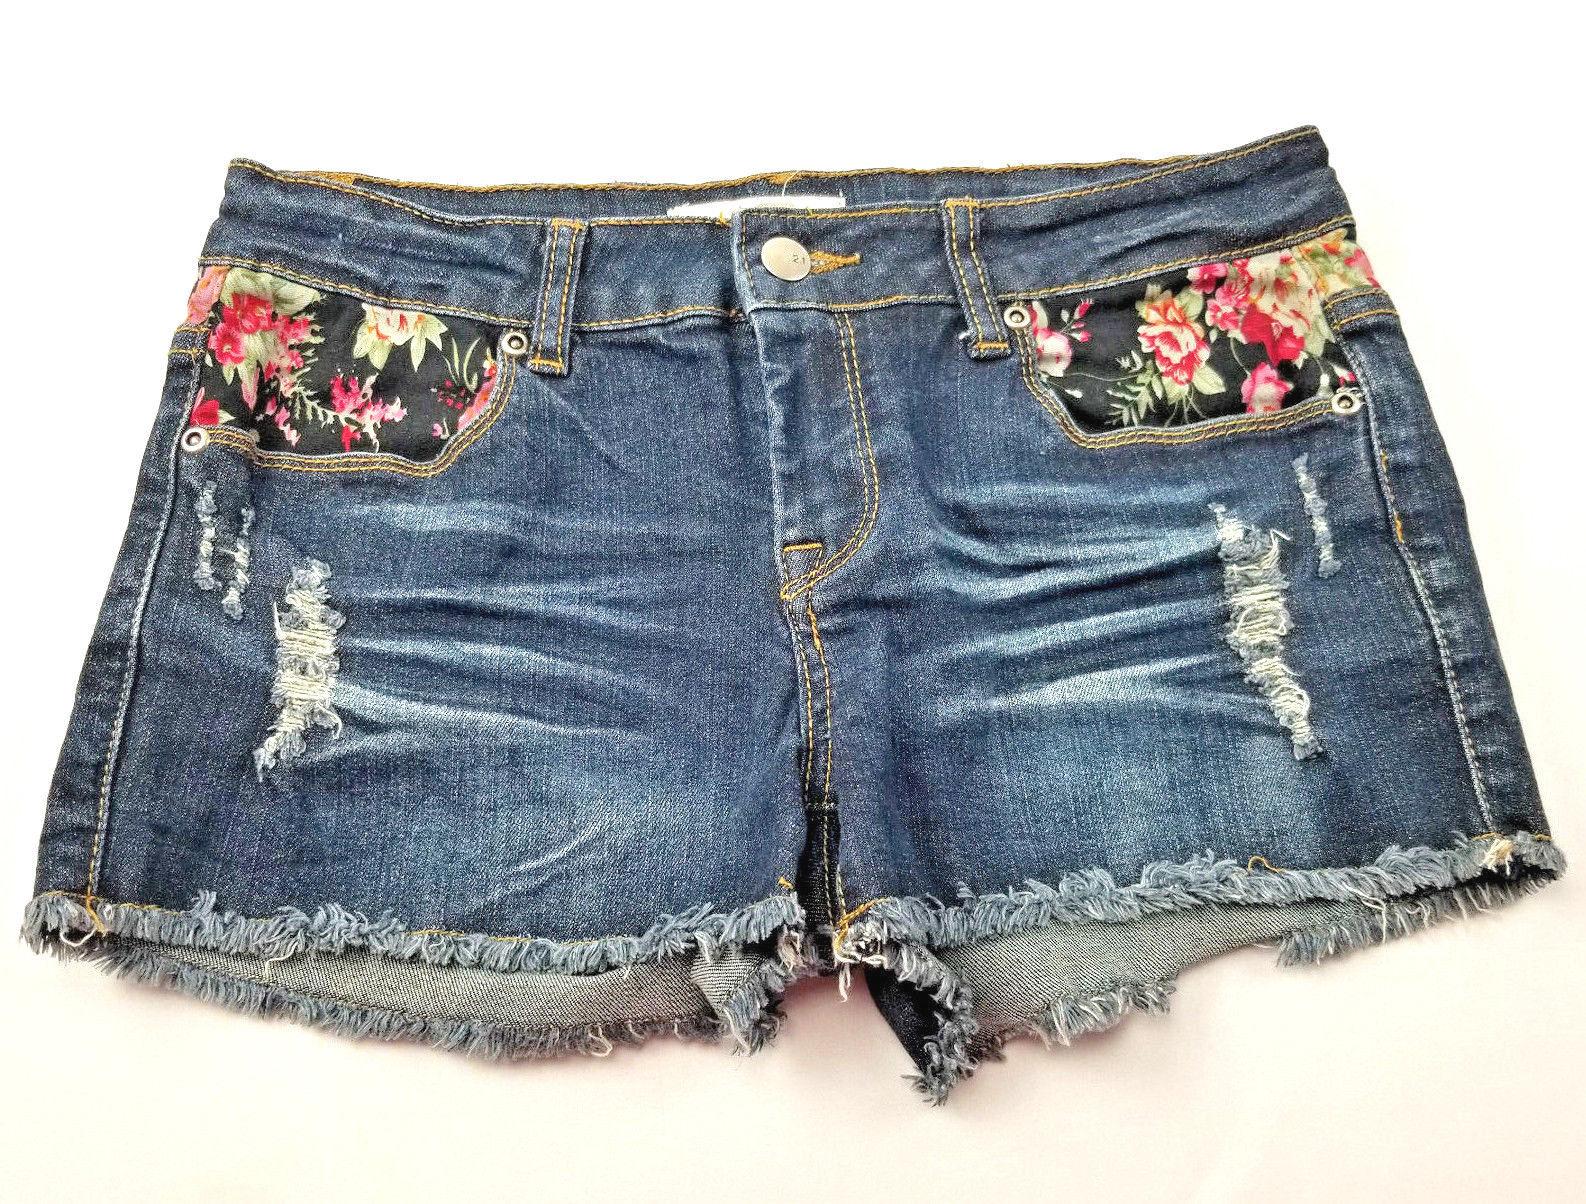 2.1 Denim Womens Jean Short Shorts Size 27 Flower Detail Distressed